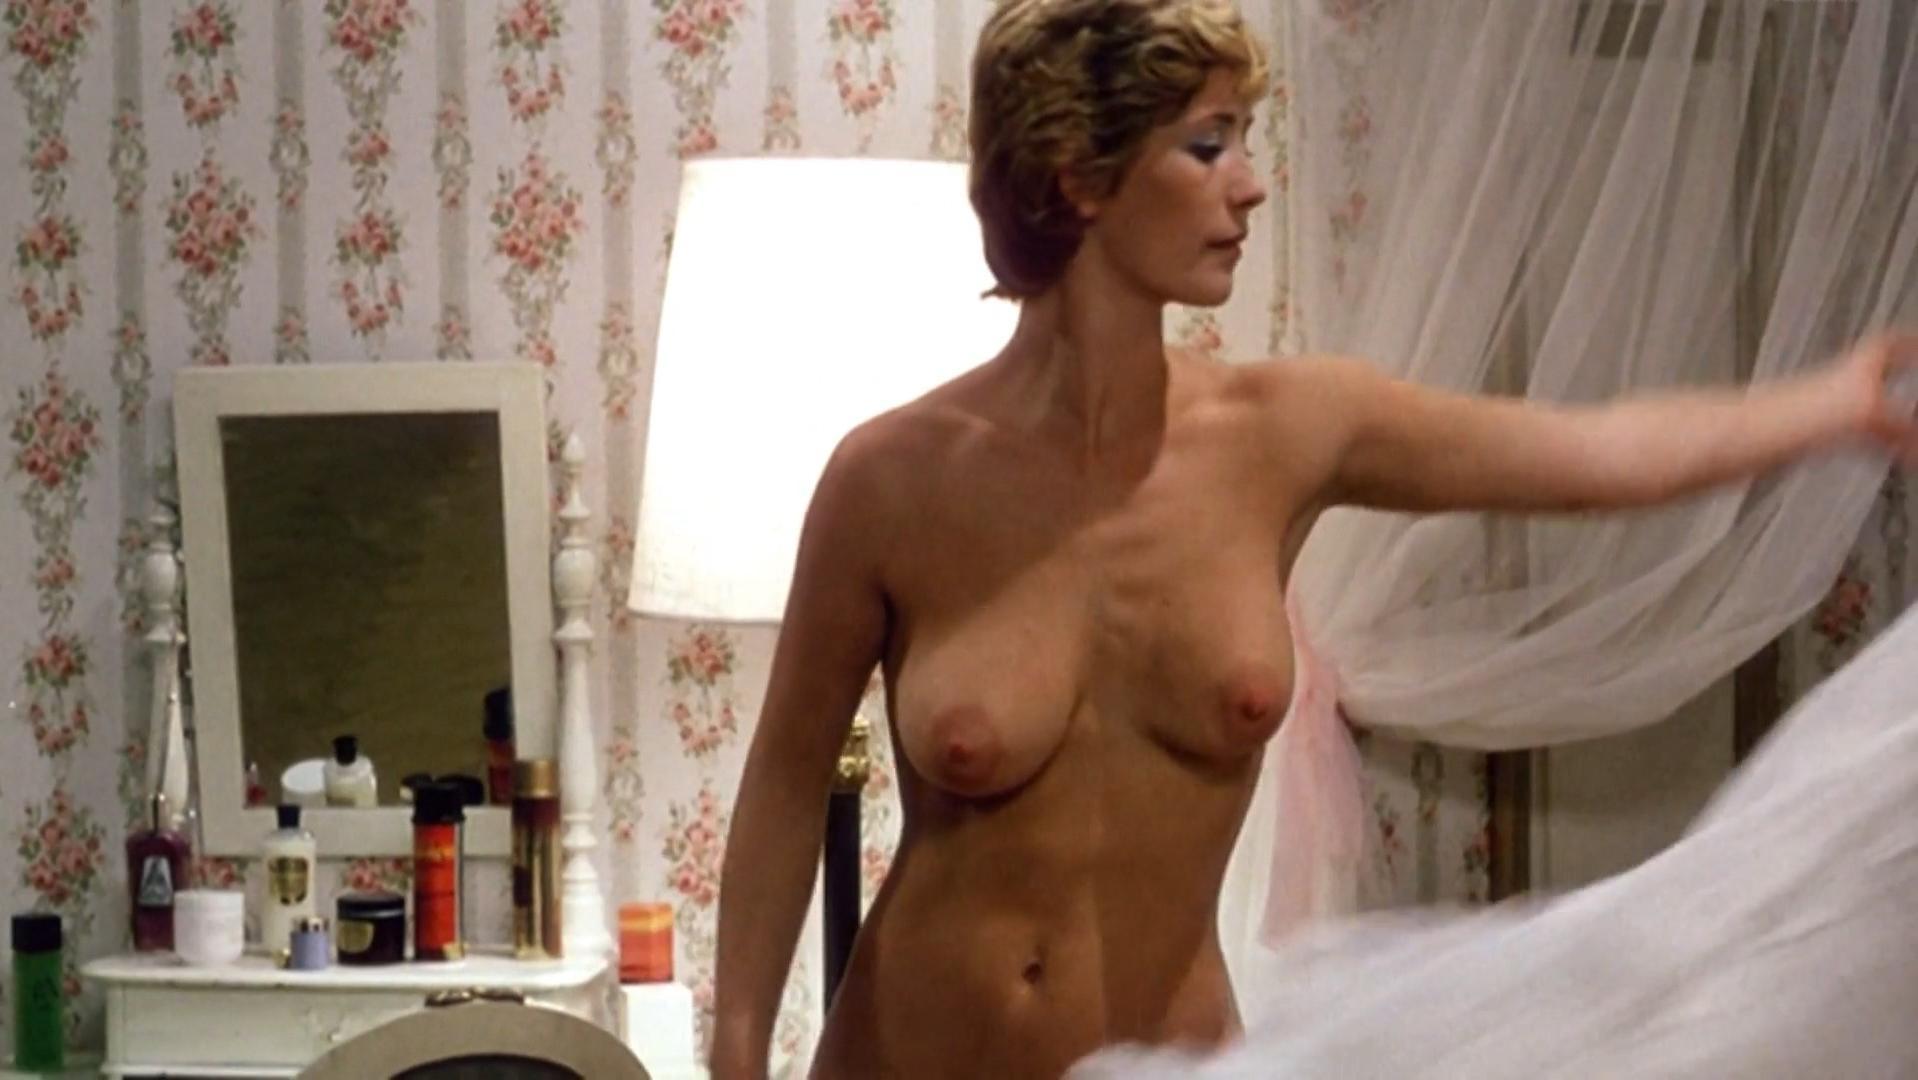 Anette Karlsen nude - Mig og mafiaen (1973)